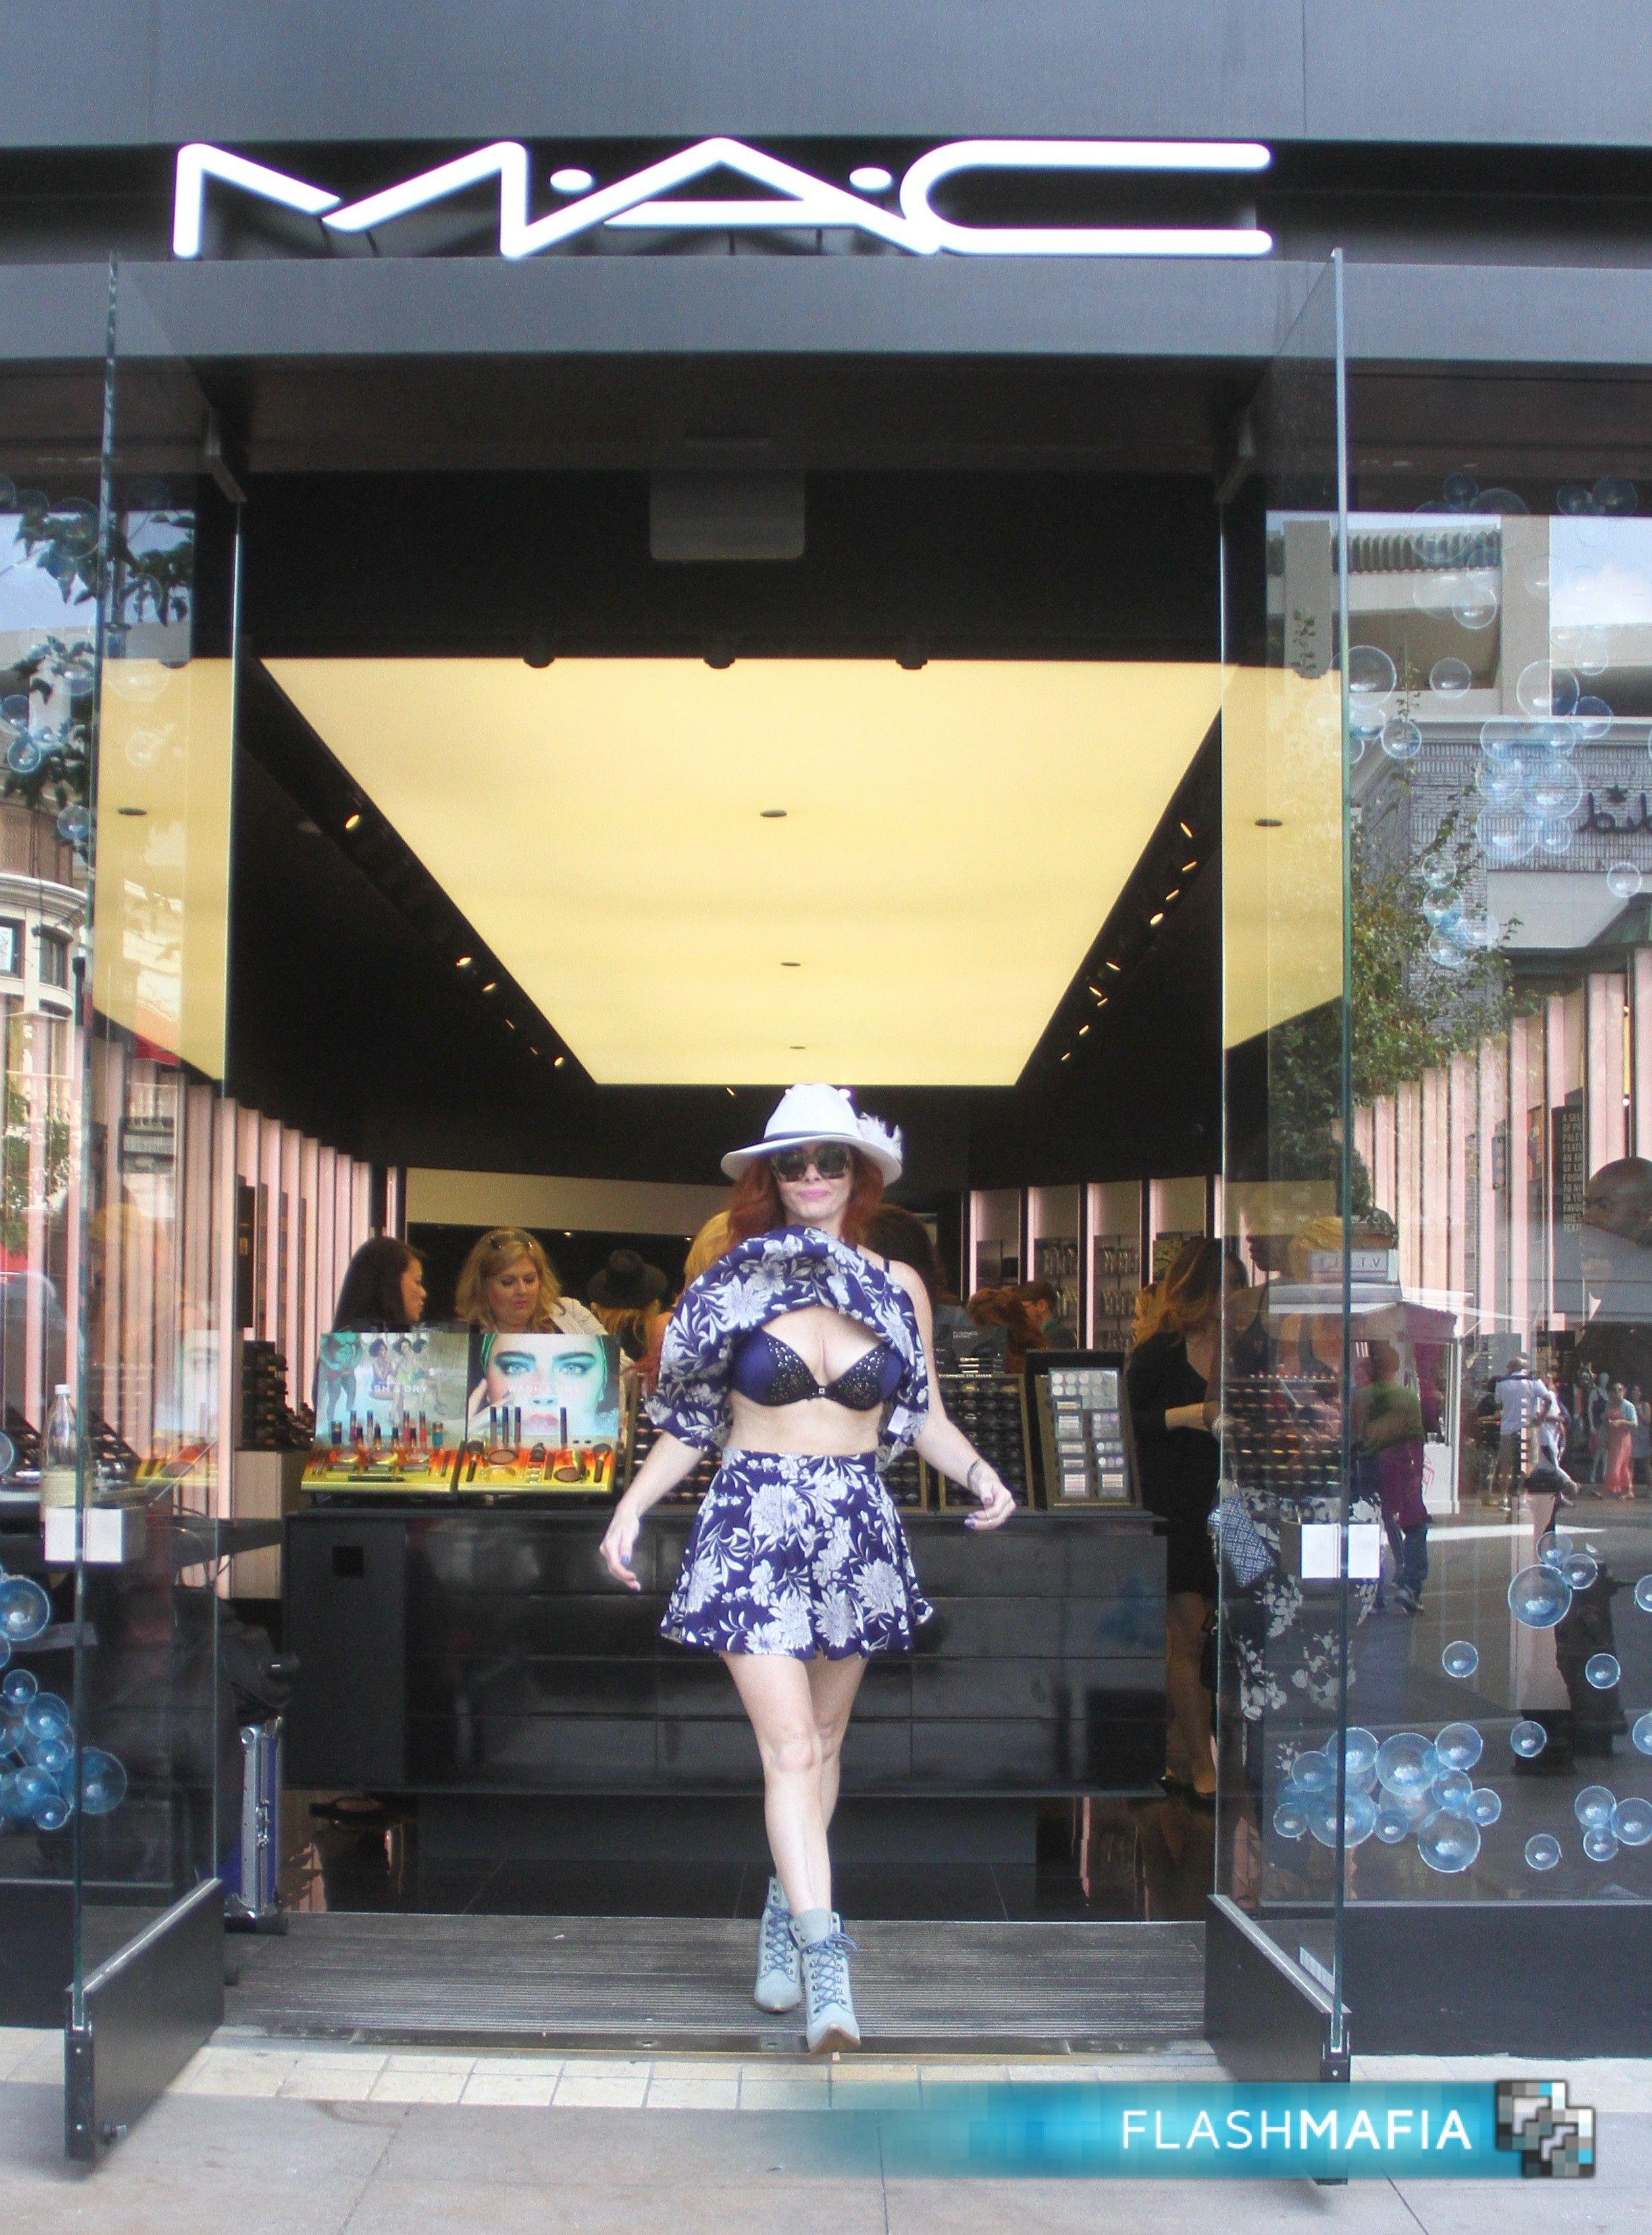 Phoebe Price Suffers Wardrobe Malfunction Outside MAC On Flashmafia